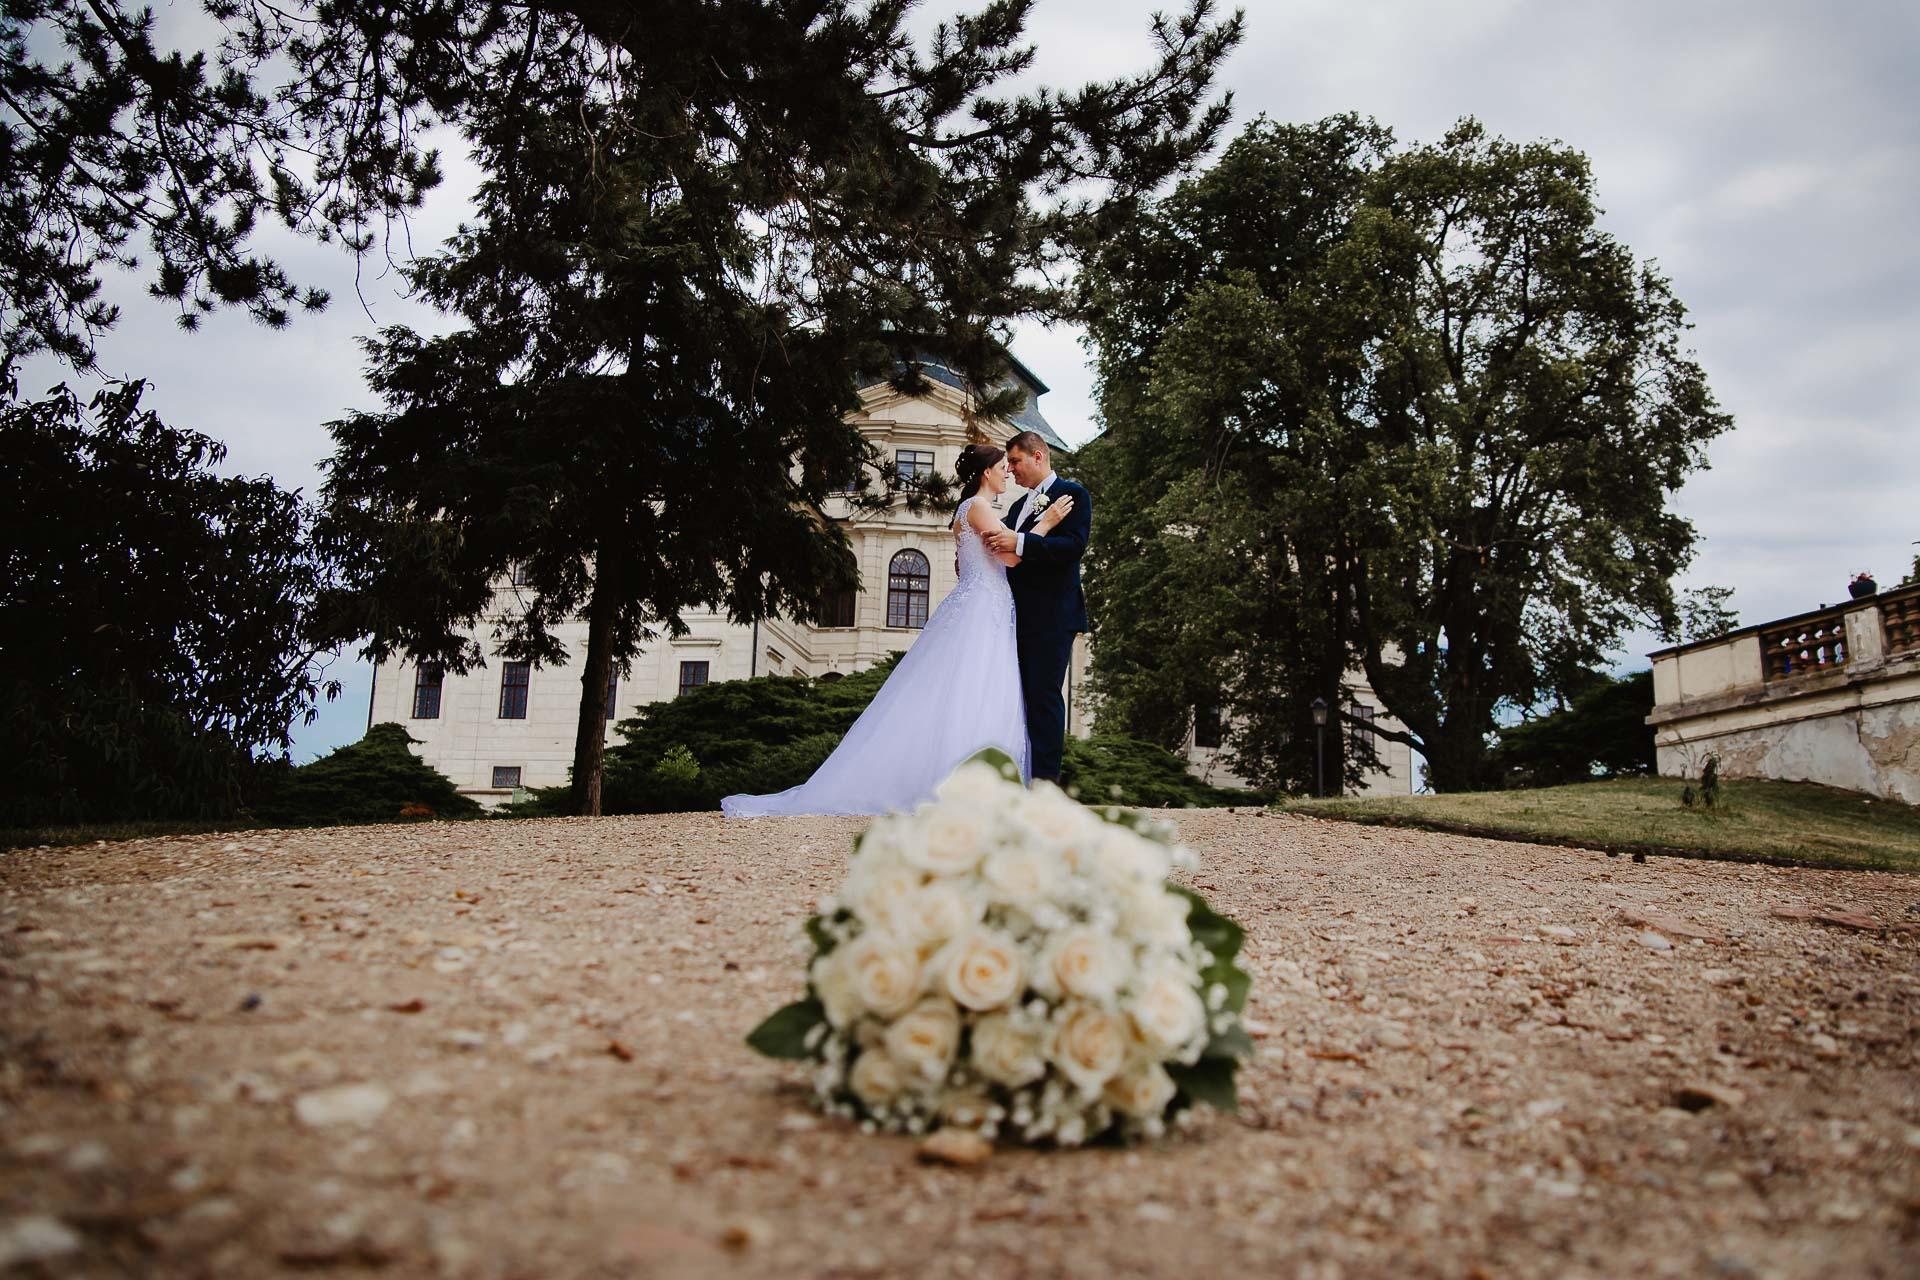 Svatební-fotograf-zámek-Karlova-Koruna-Chlumec-nad-Cidlinou-146